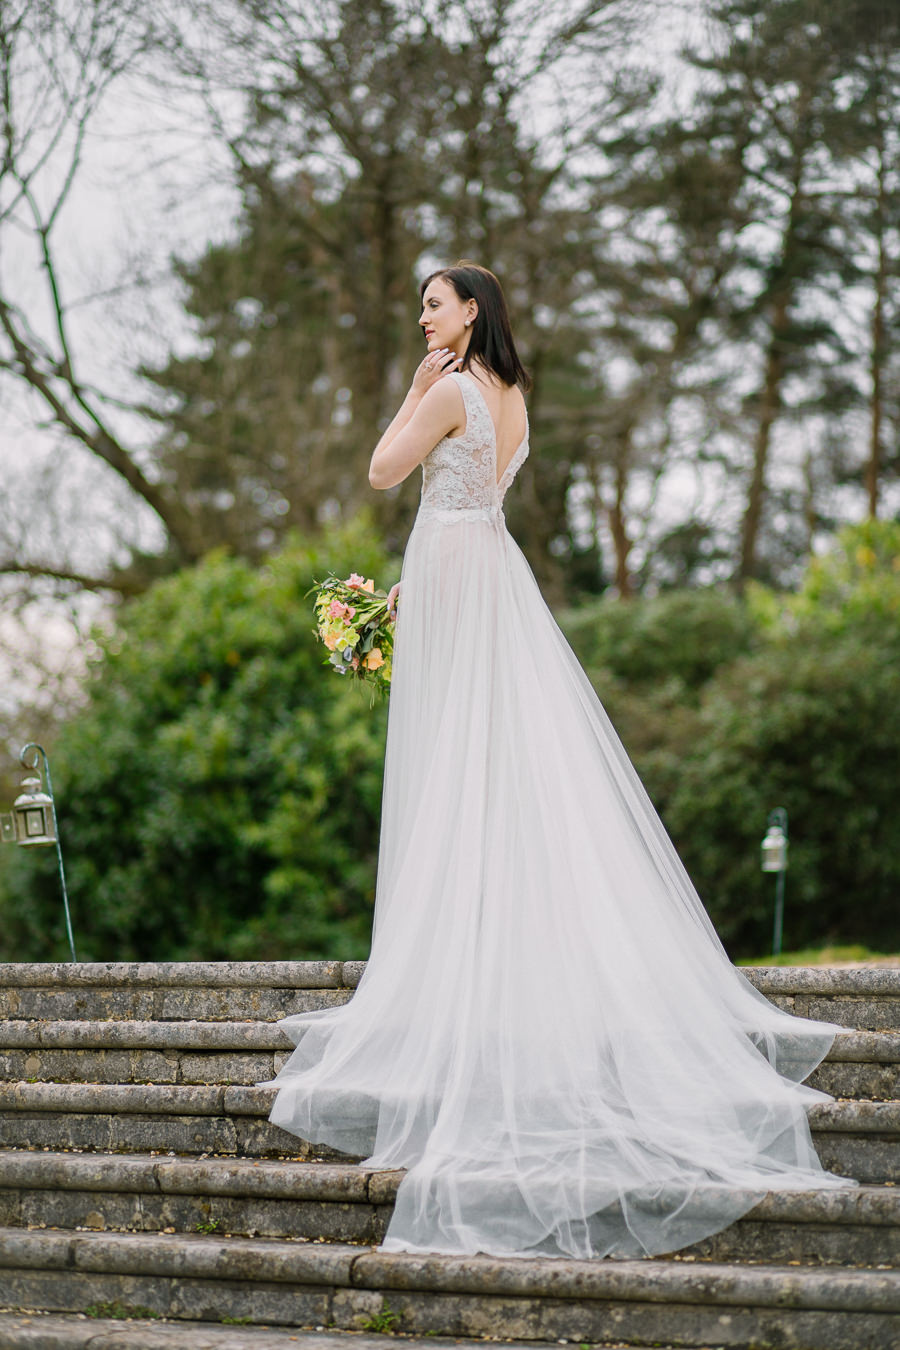 'Understated Elegance' Spring Styled Hampshire Bridal Shoot – Rownhams House, photo credit Nisha Haq Photography (18)